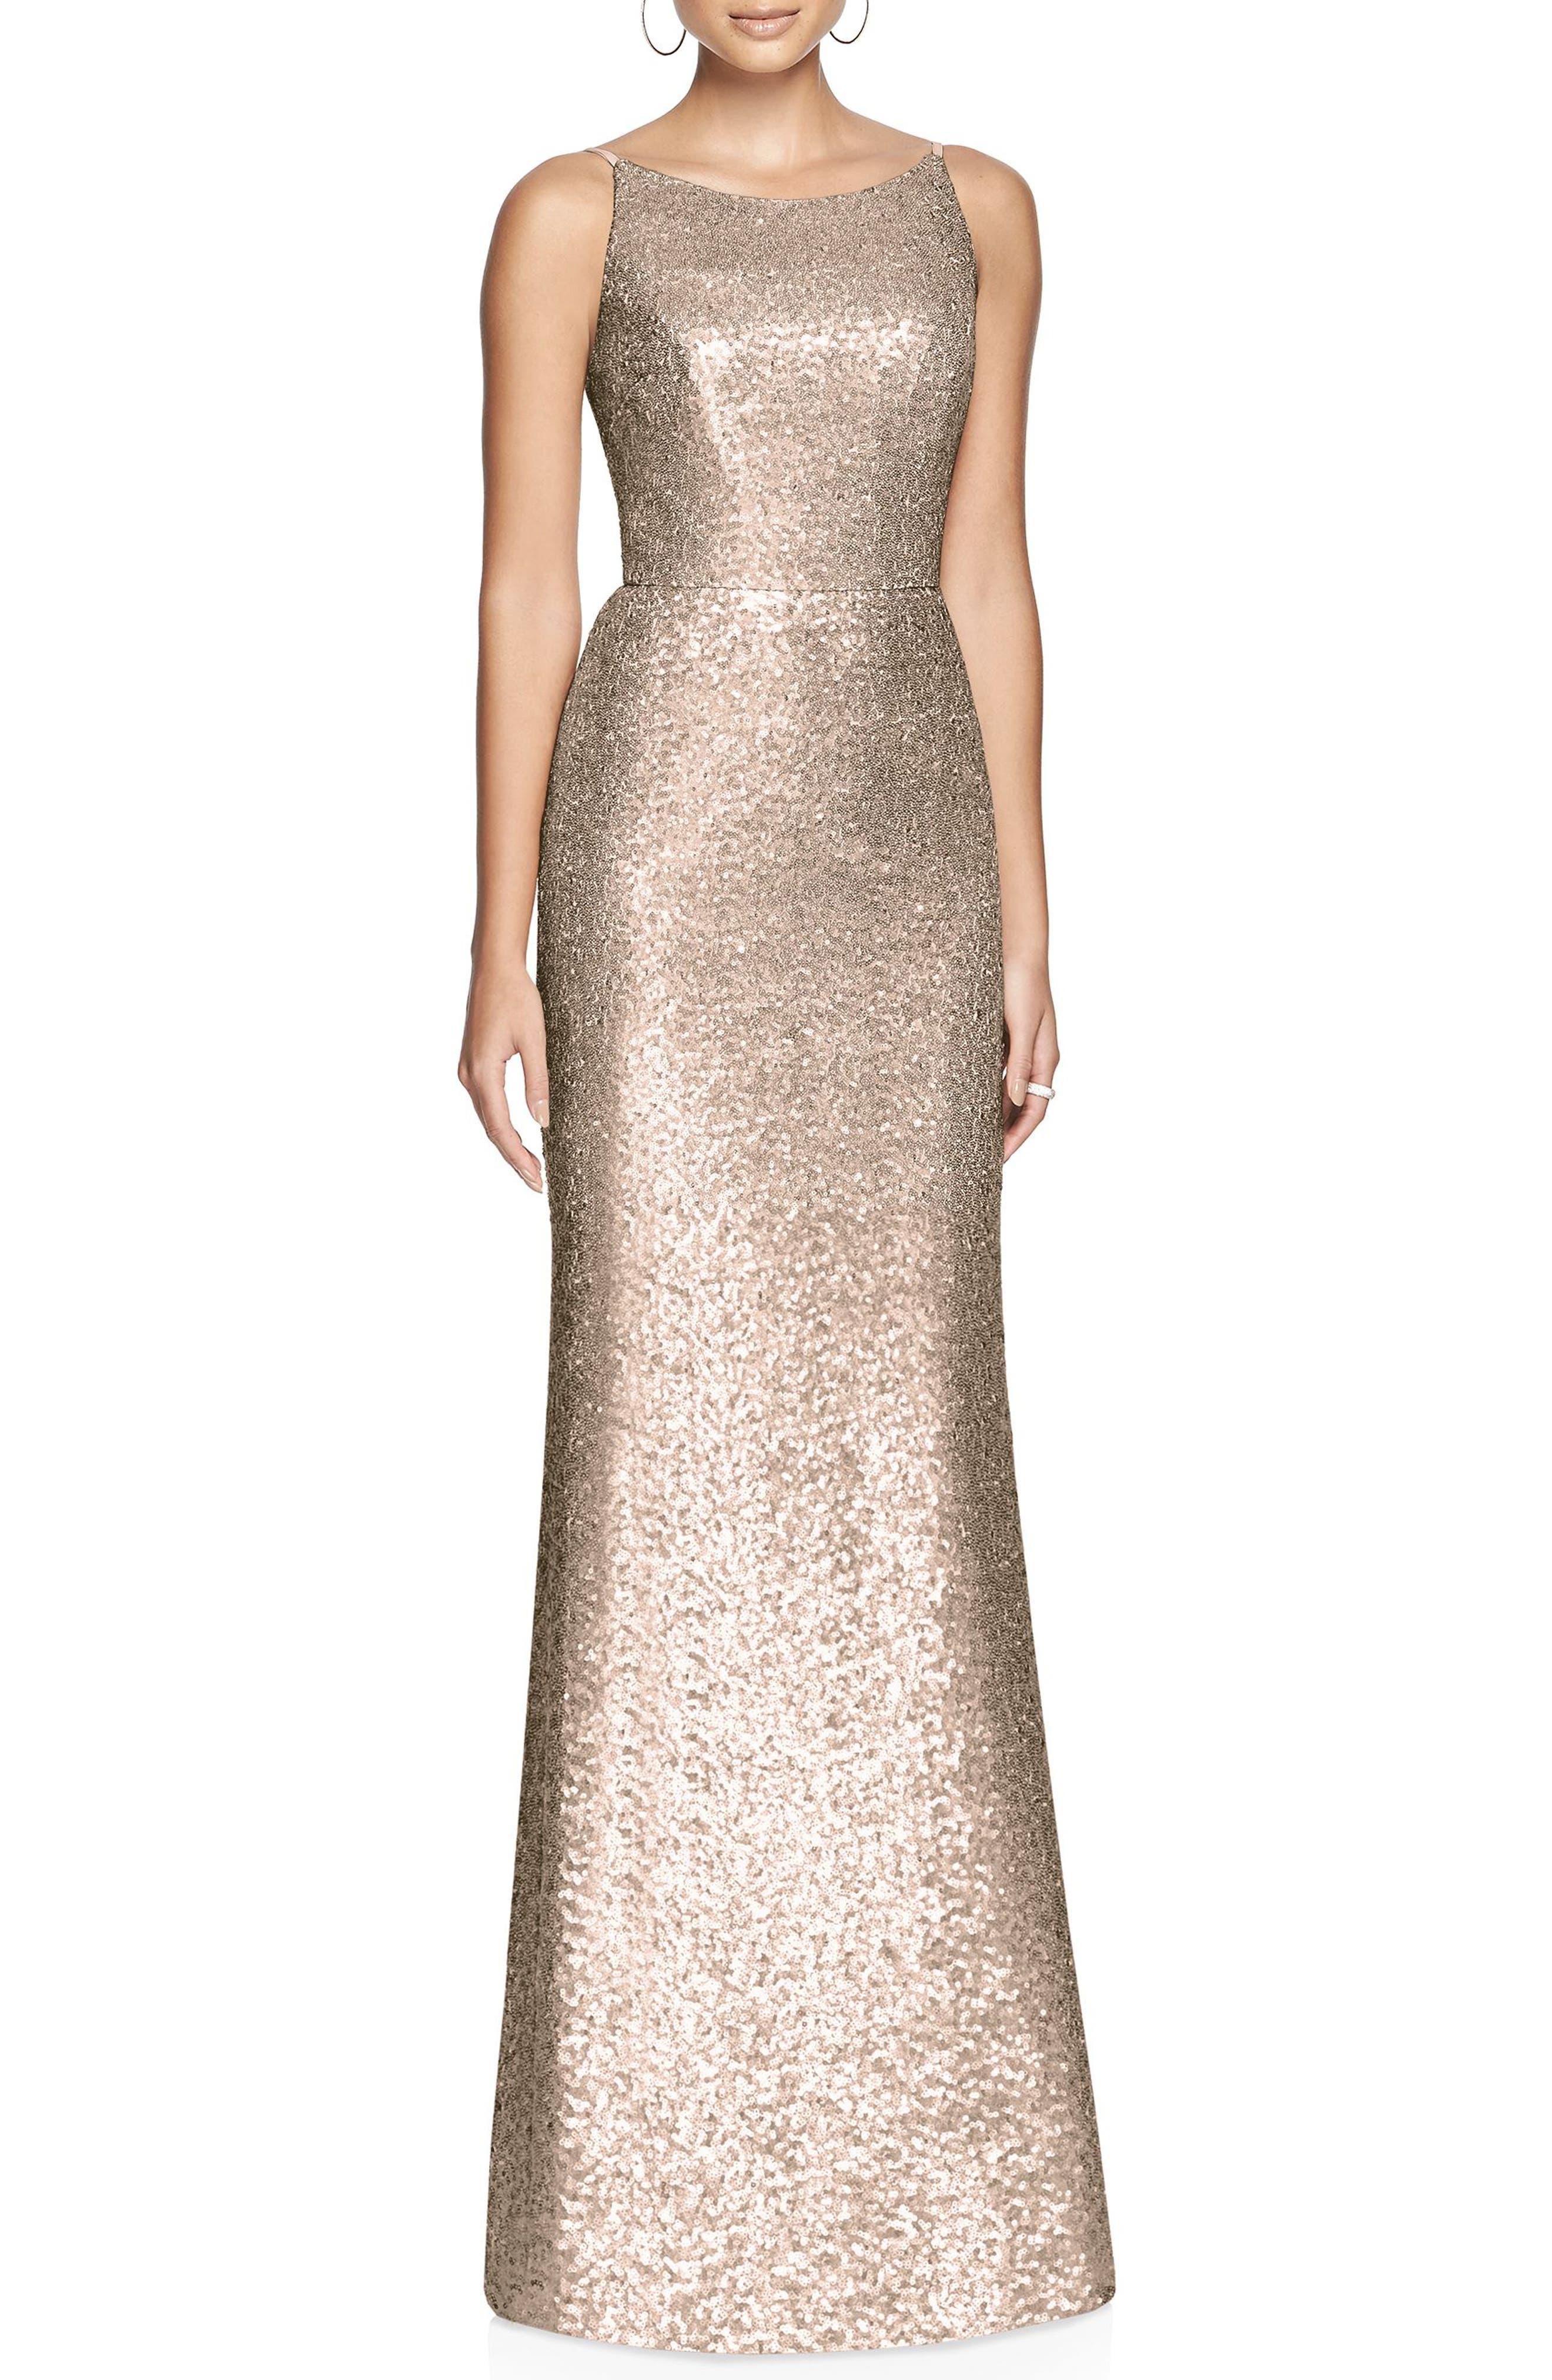 Main Image - Dessy Collection Bateau Neck Sequin Gown